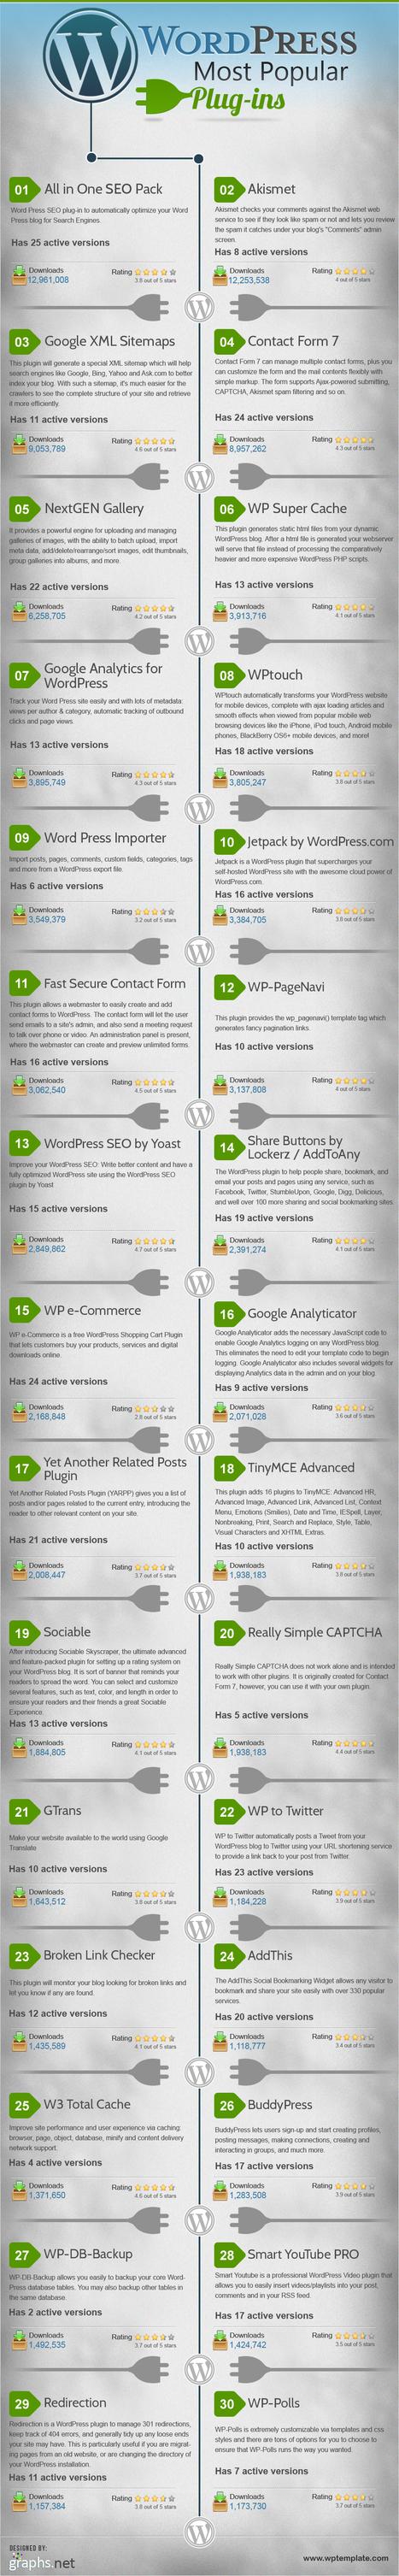 Most popular plugins | Infographics | Scoop.it